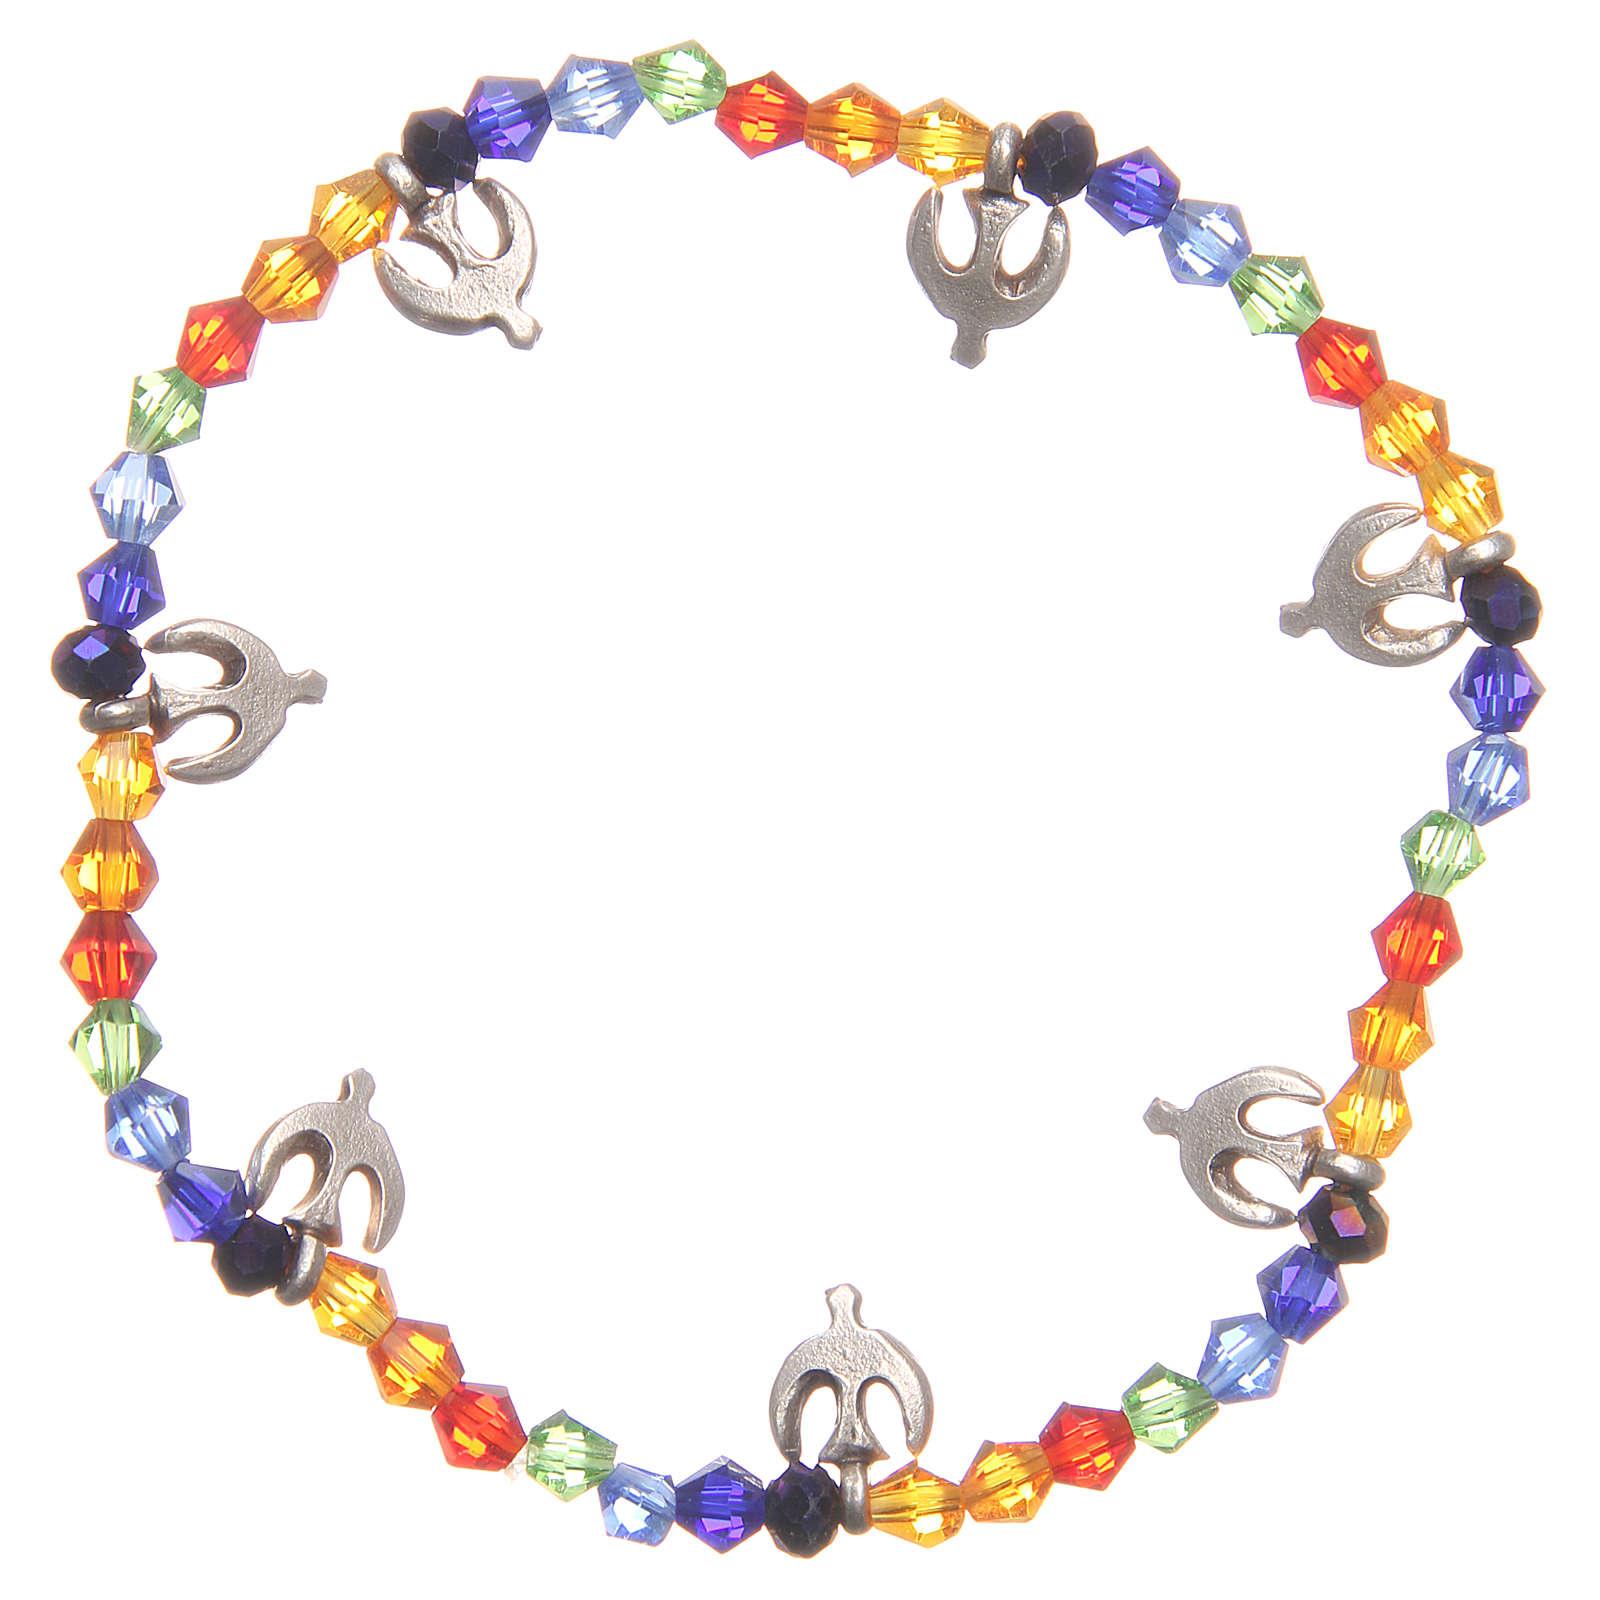 Bracciale pace perline arcobaleno 4